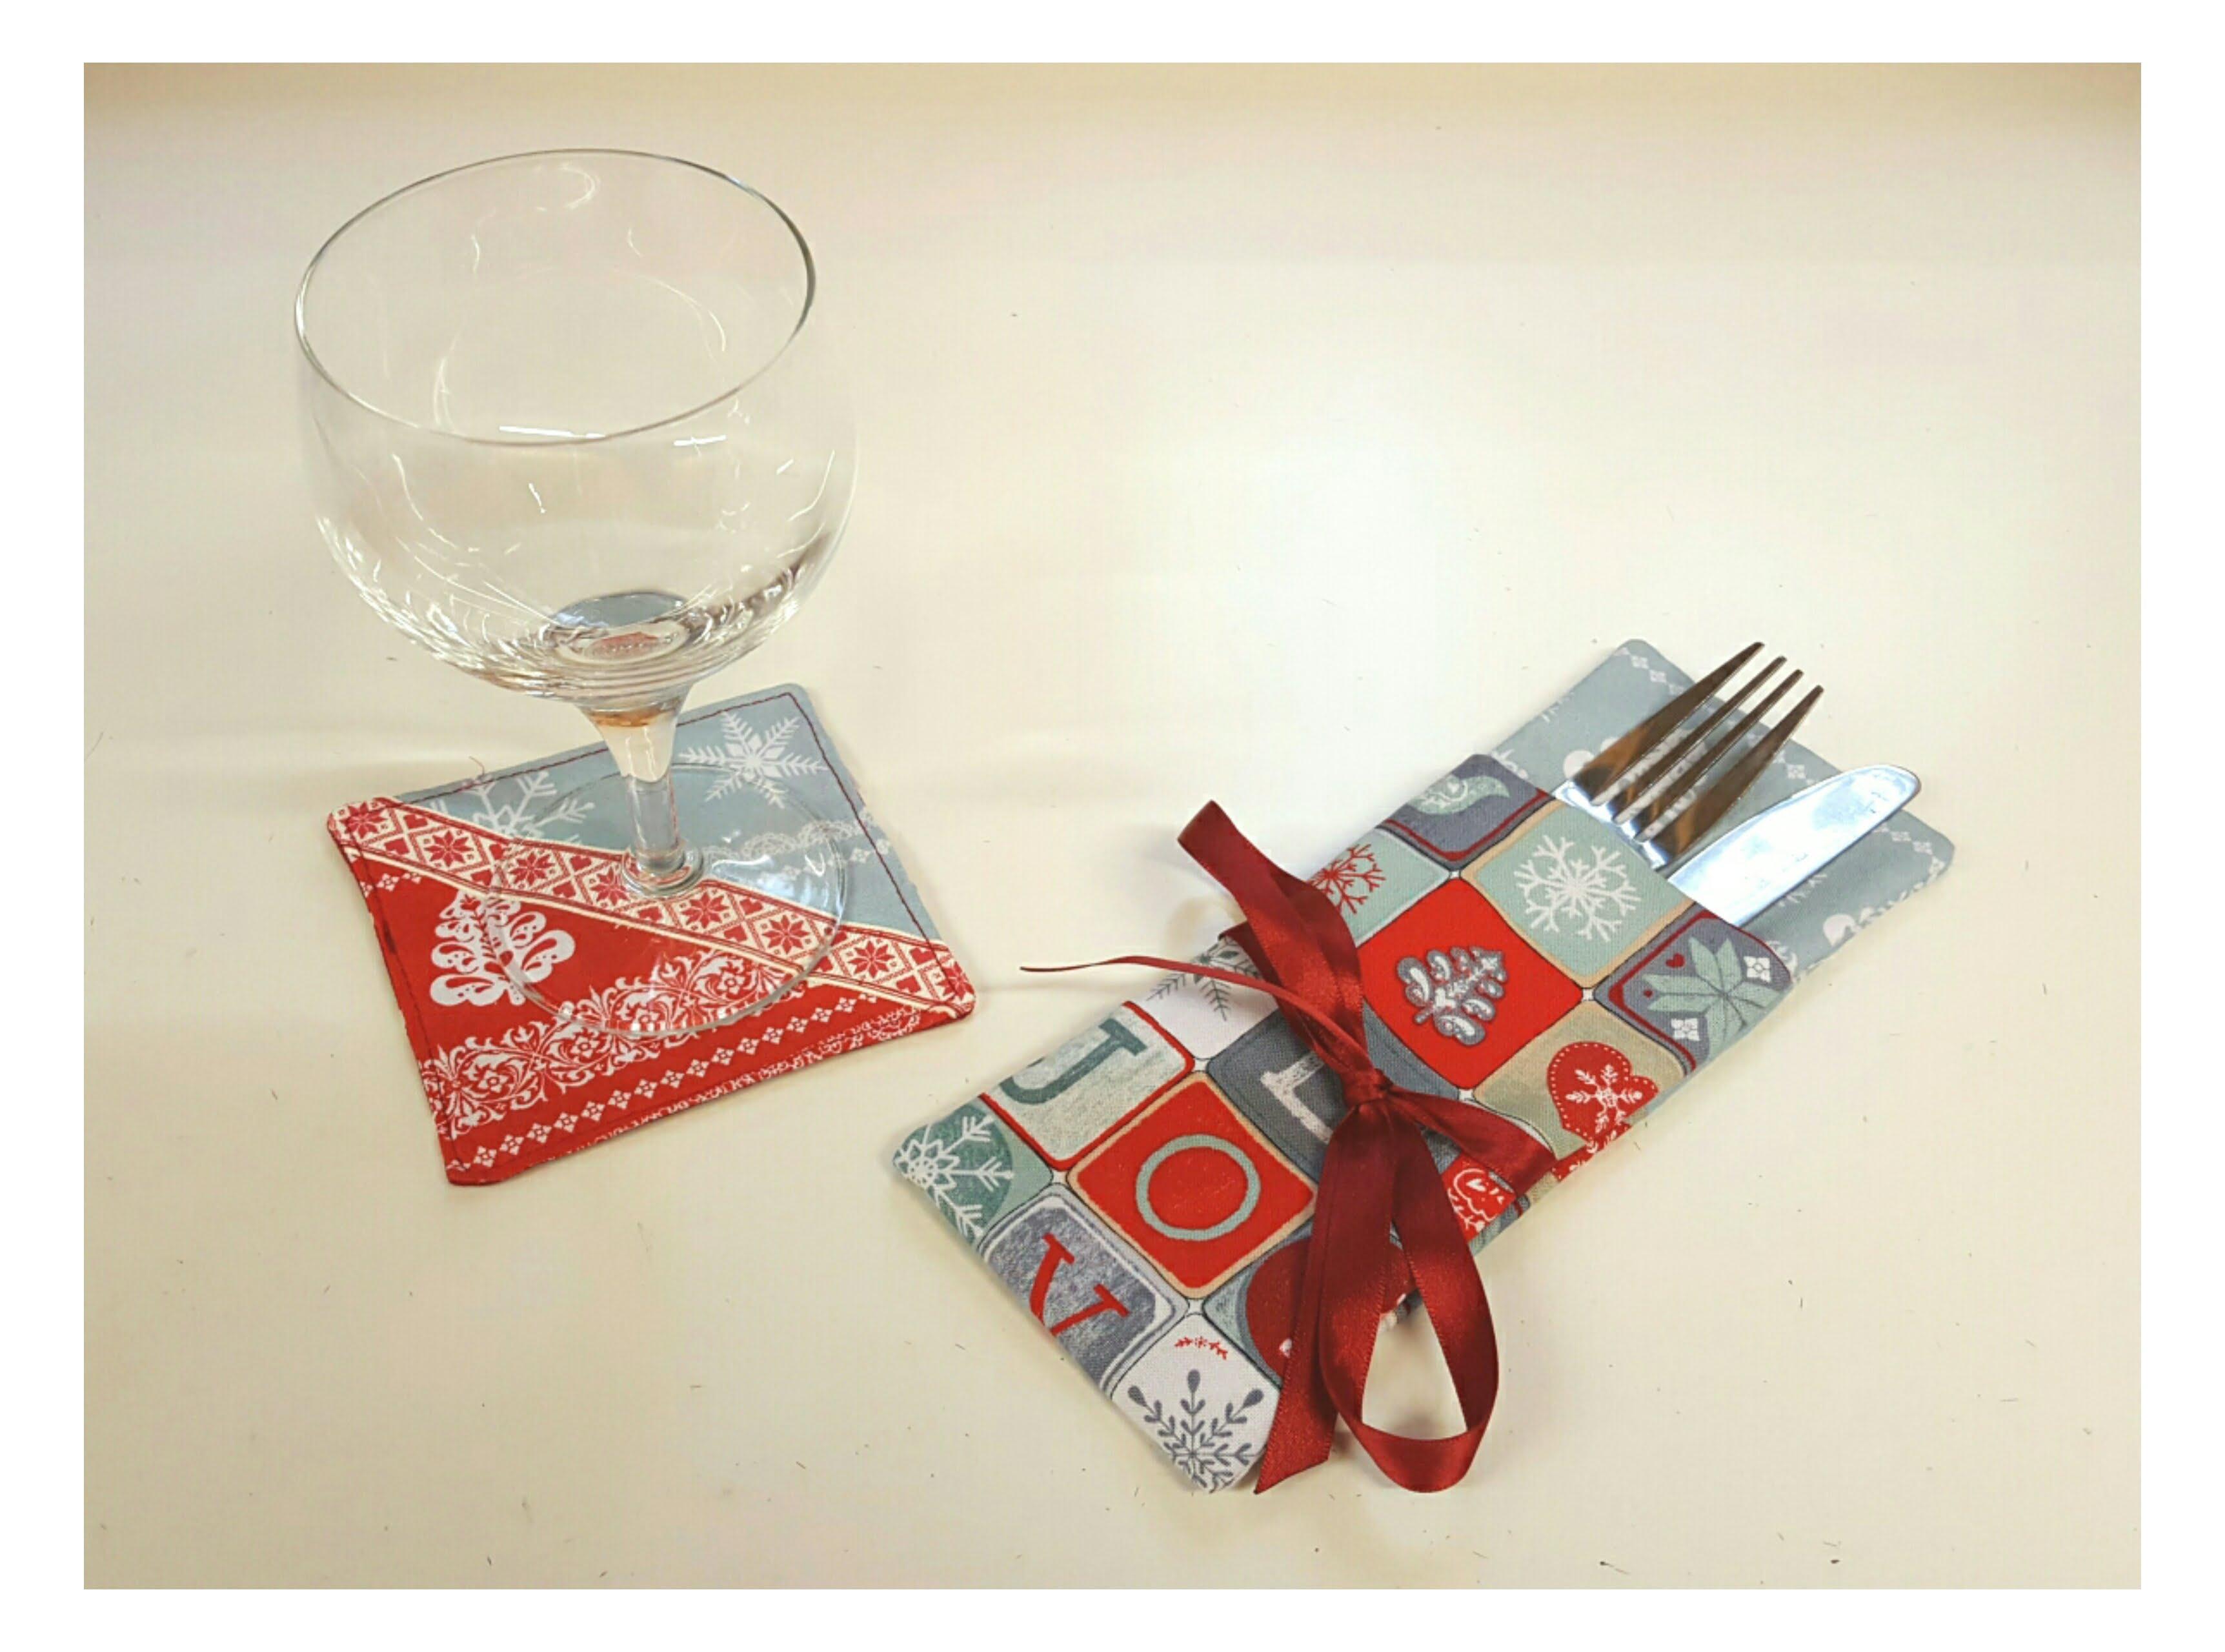 Cutlery Holder & Coaster Fun day